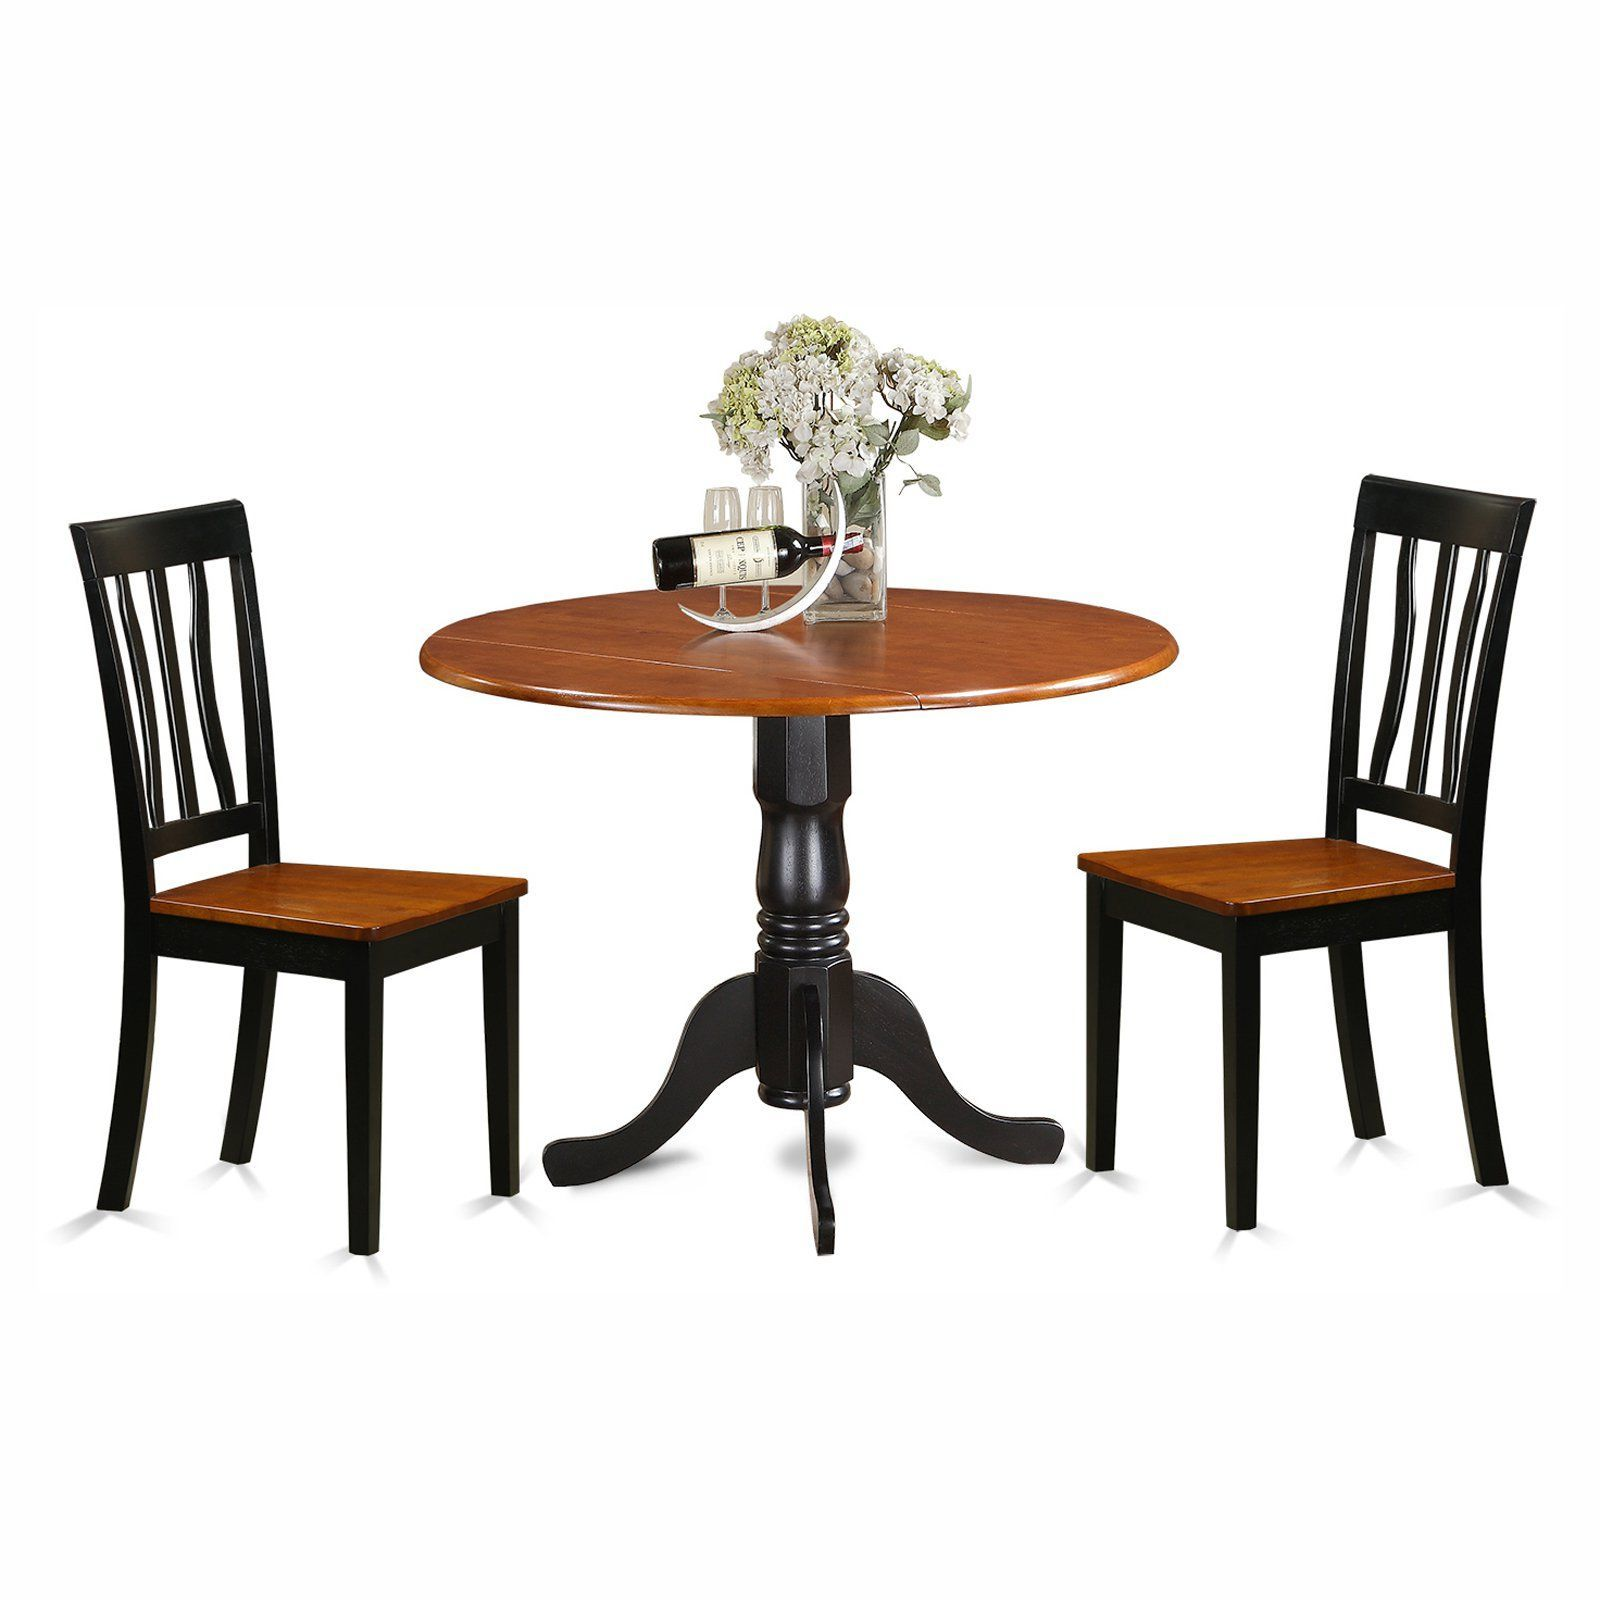 East west furniture dublin 3 piece drop leaf round dining table set east west furniture dublin 3 piece drop leaf round dining table set with antique wooden seat dzzzfo